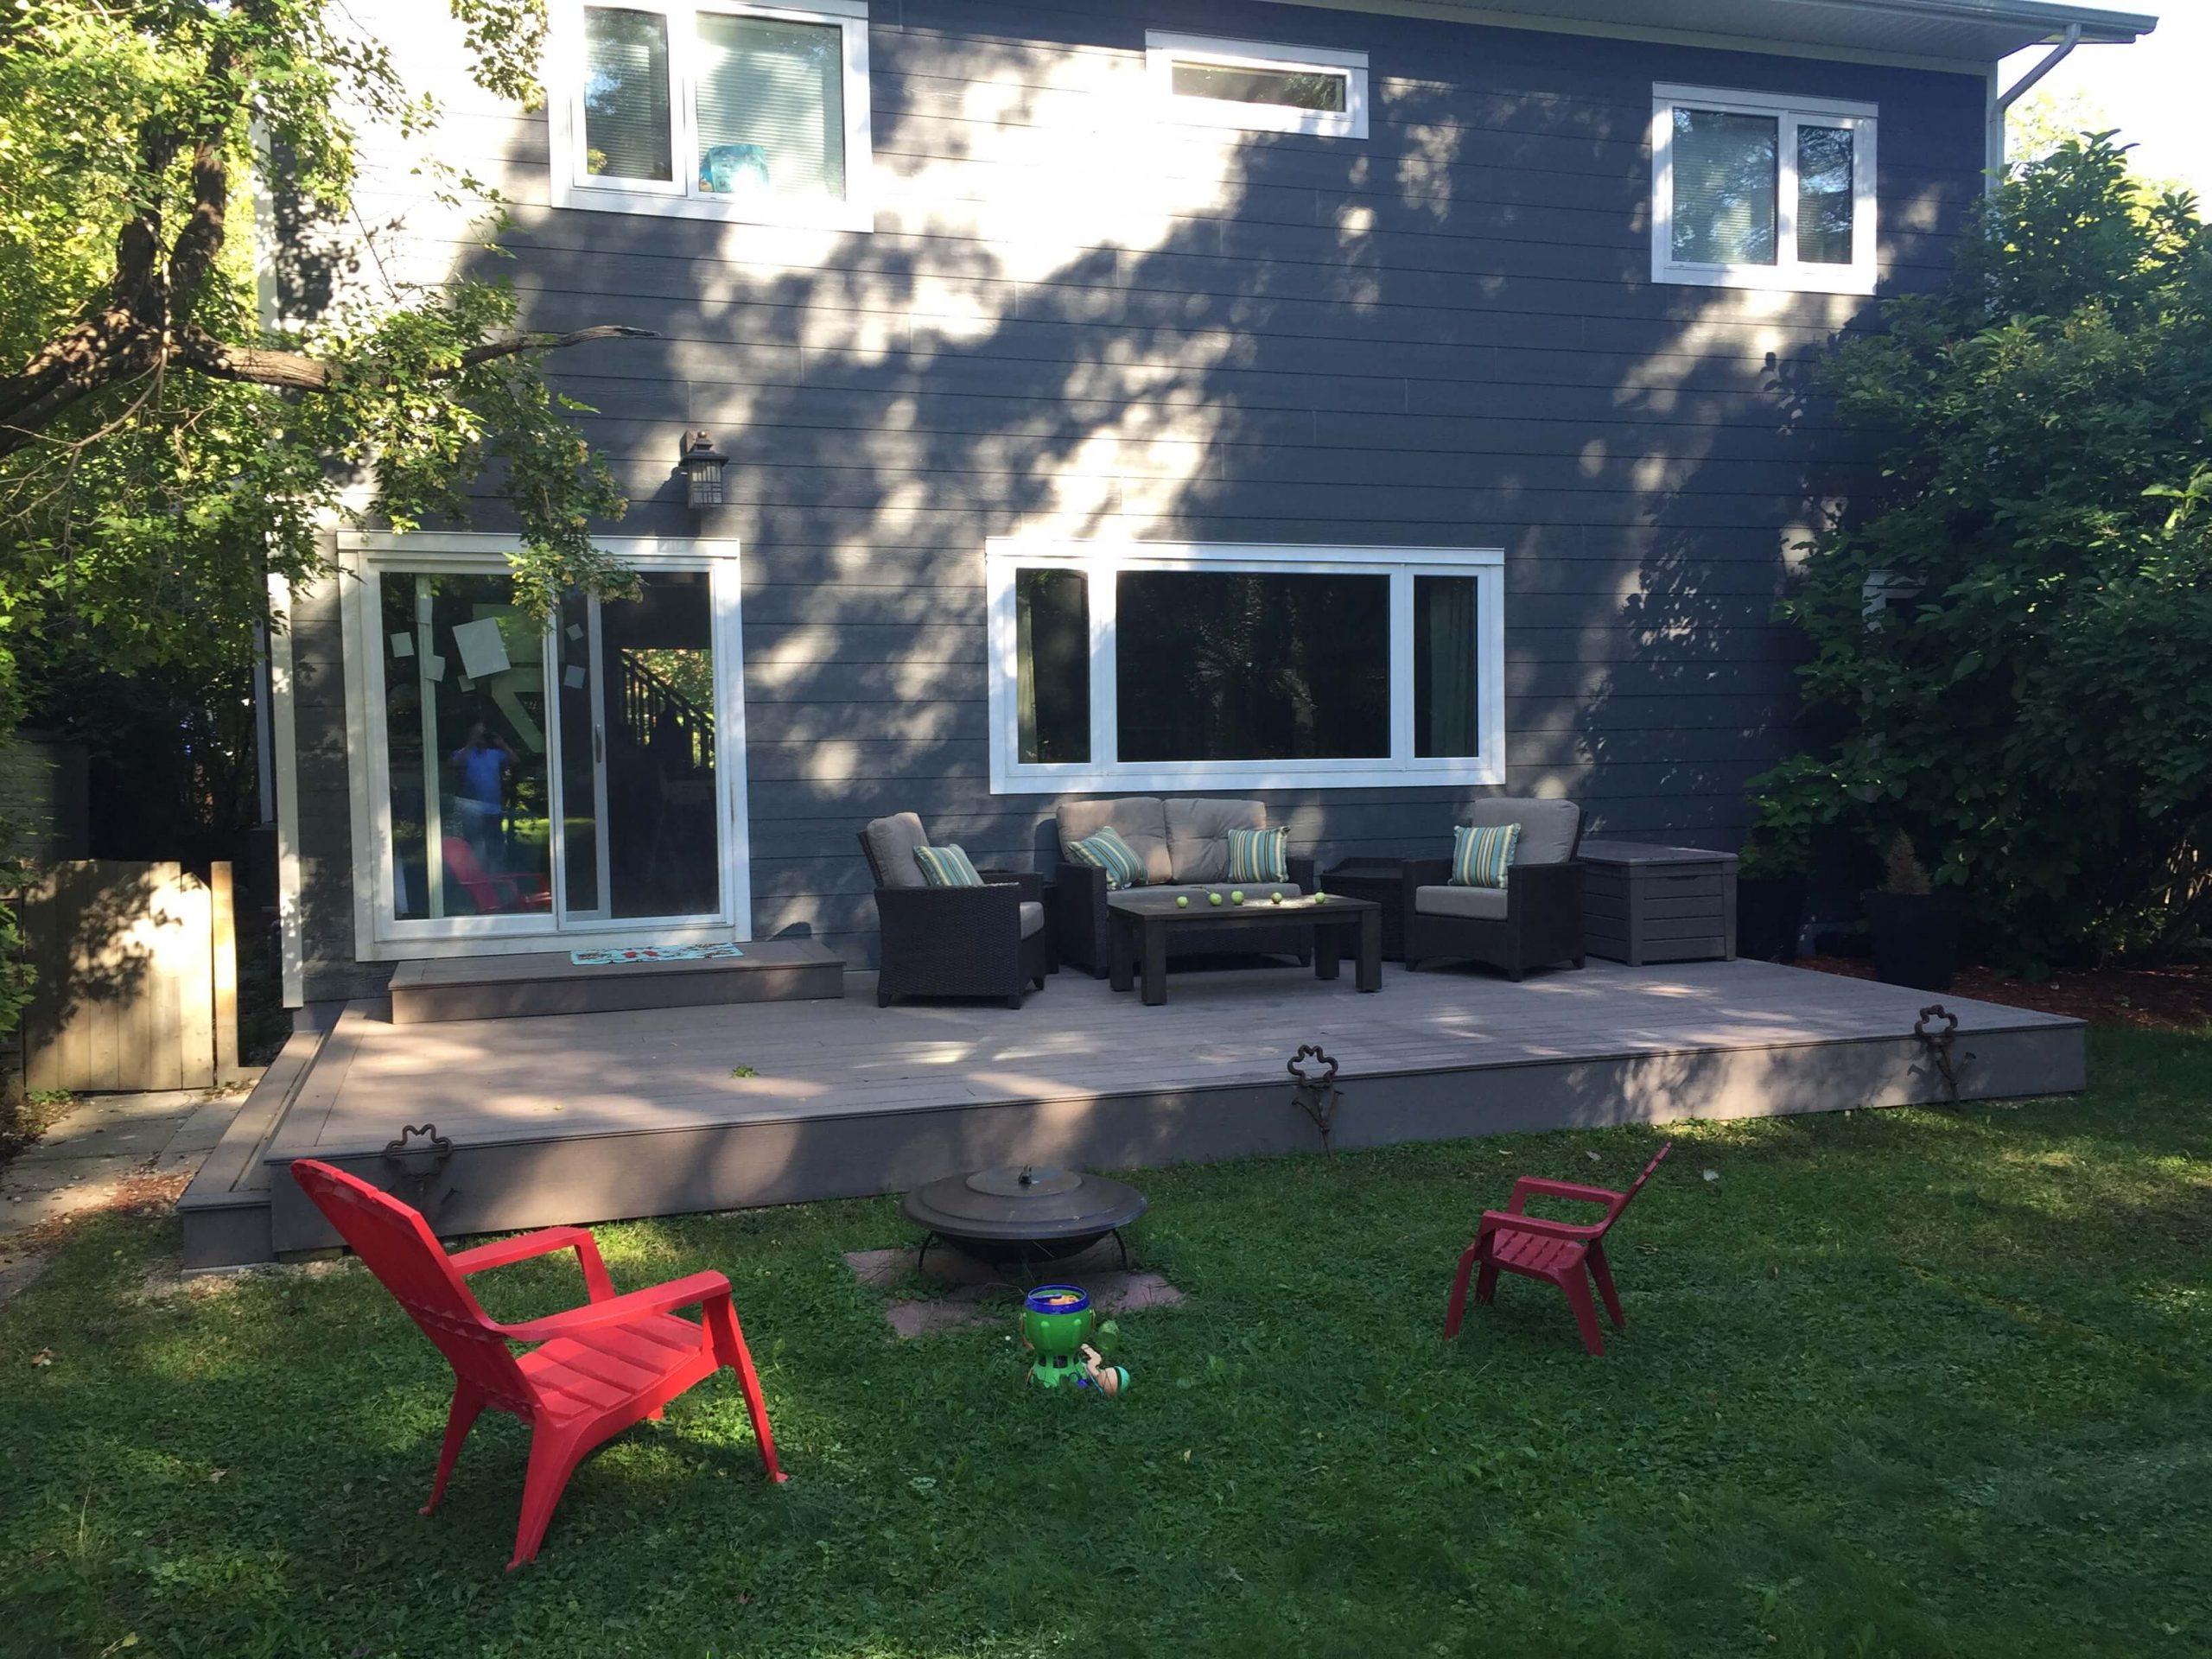 Deck - Composite - Wildwood Park - All Canadian Renovations Ltd. - Kitchen and Bathroom Renovations Winnipeg, Manitoba